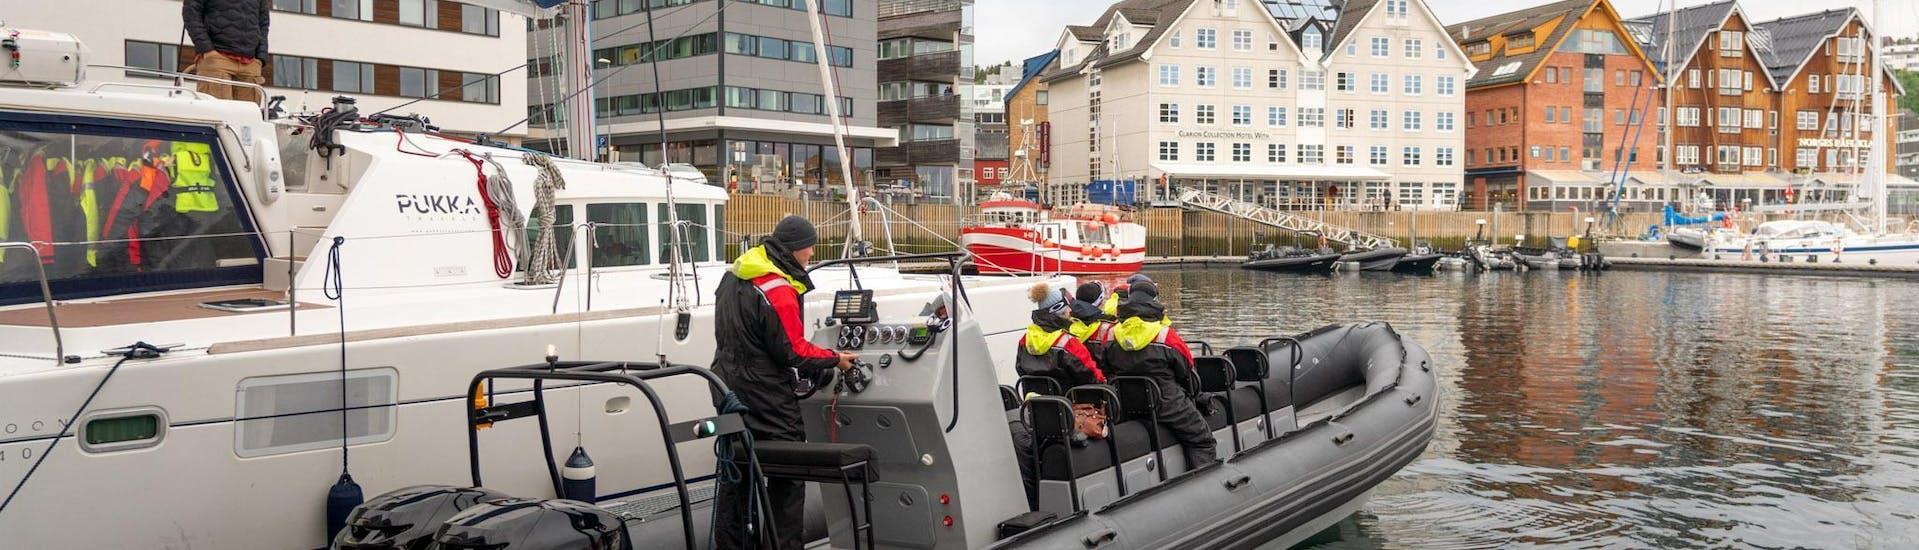 Arctic RIB High Speed Boat Tour in Tromsø with Pukka Travels Tromsø & Svolvær - Hero image